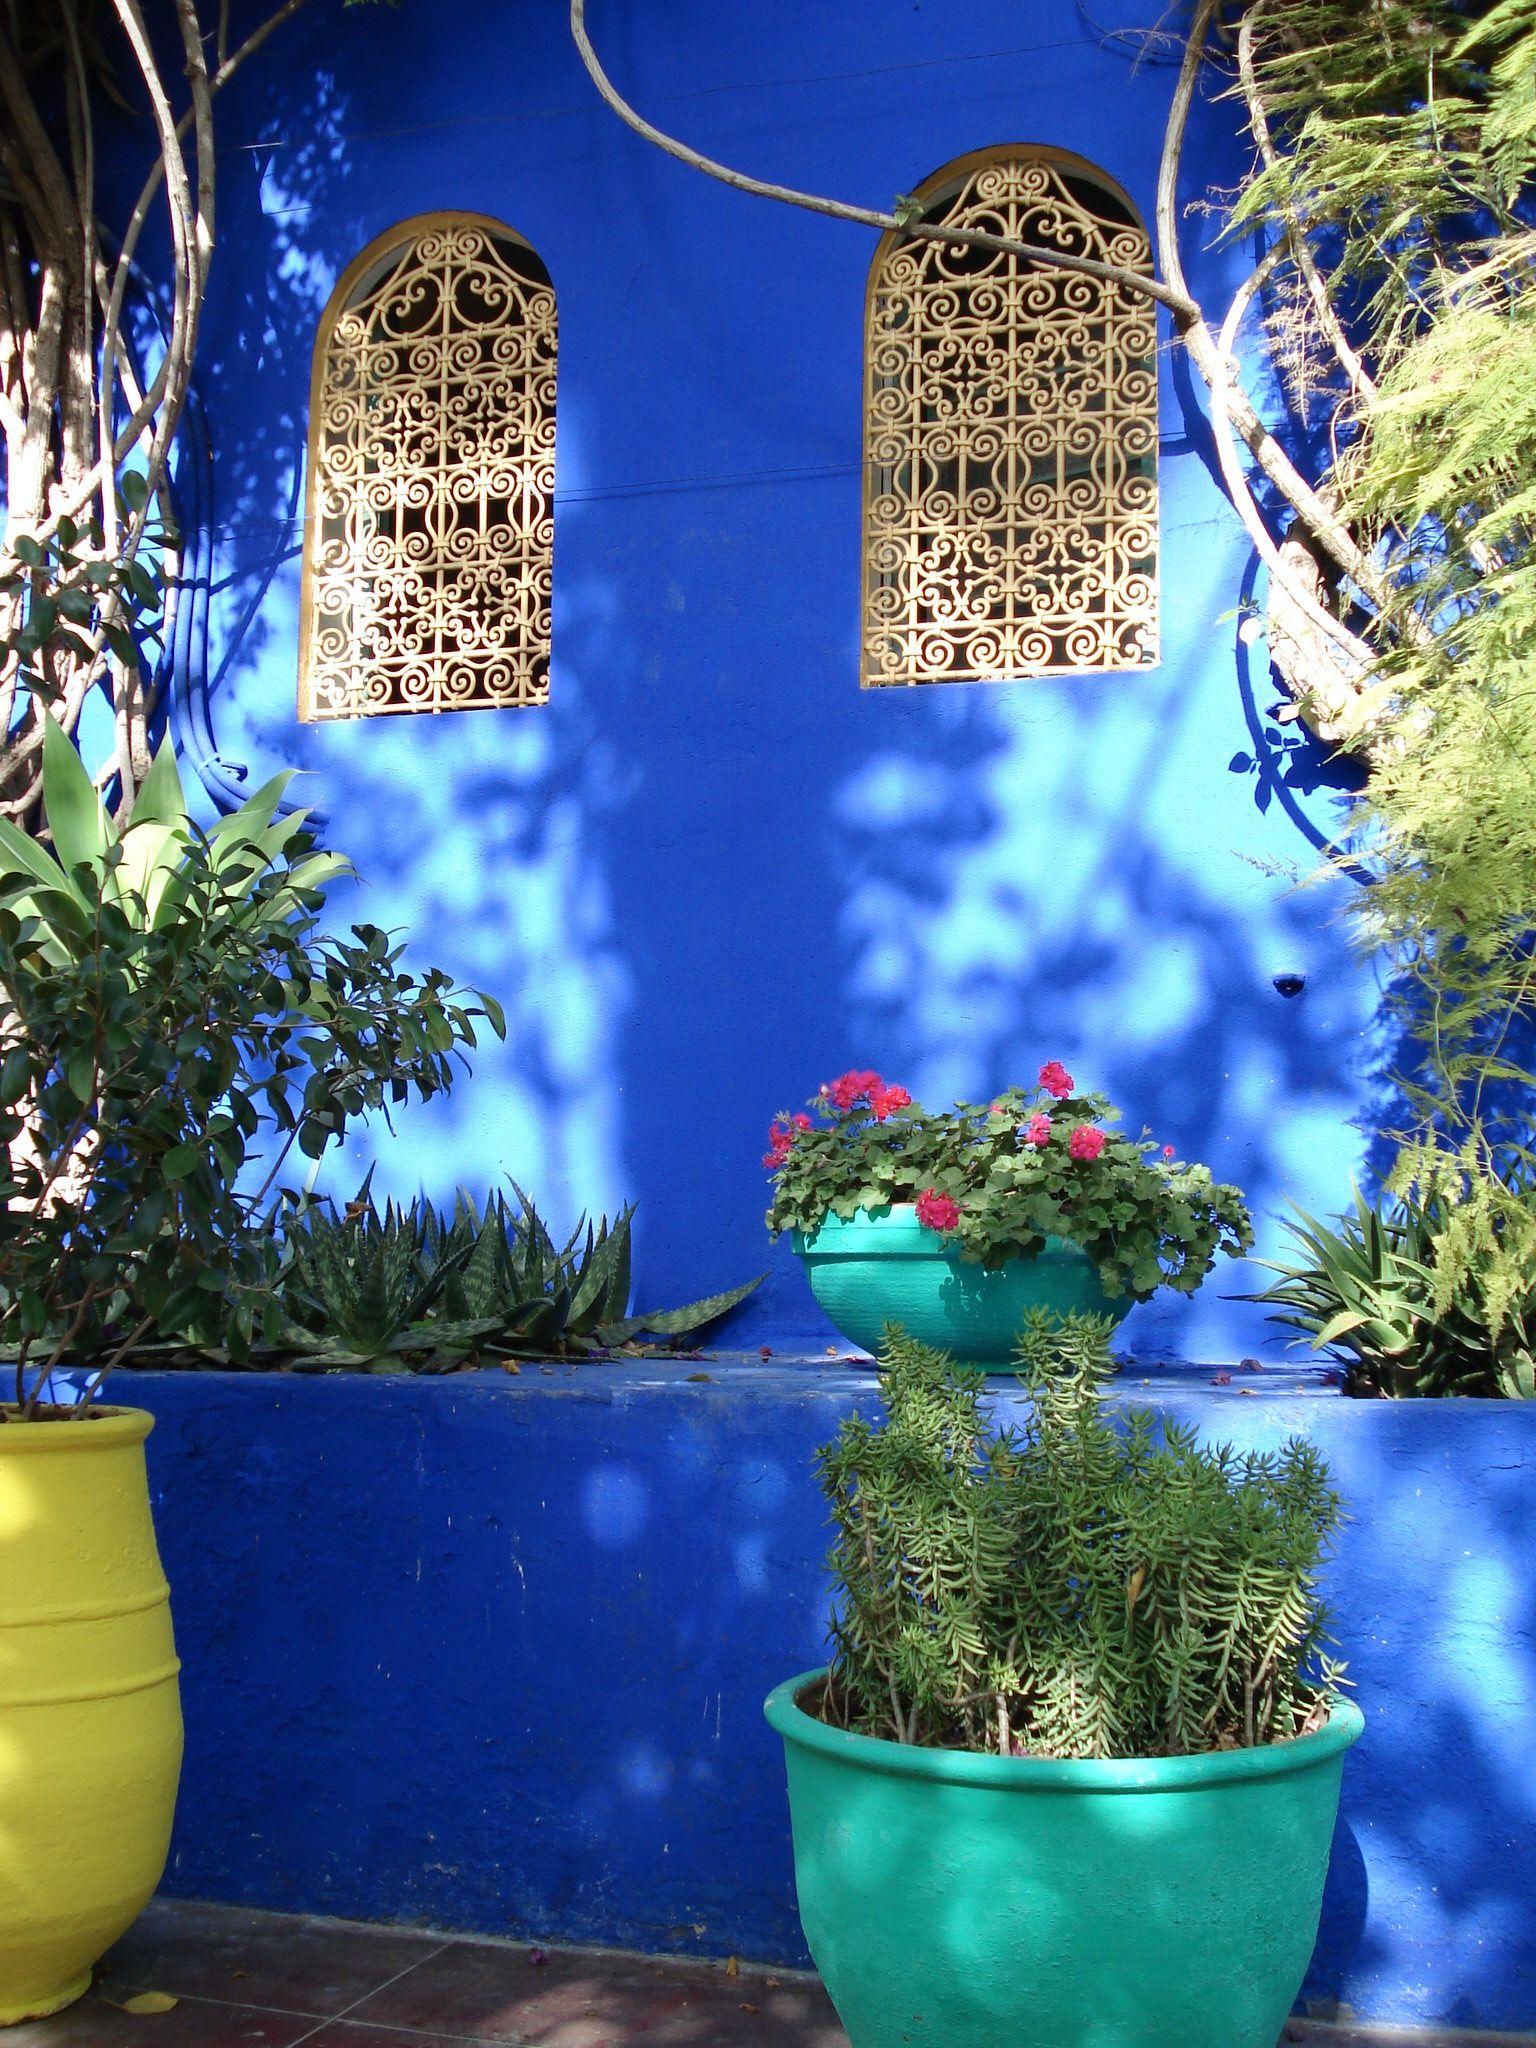 Les Jardins De Majorelle In Marakesh Morocco They Were All